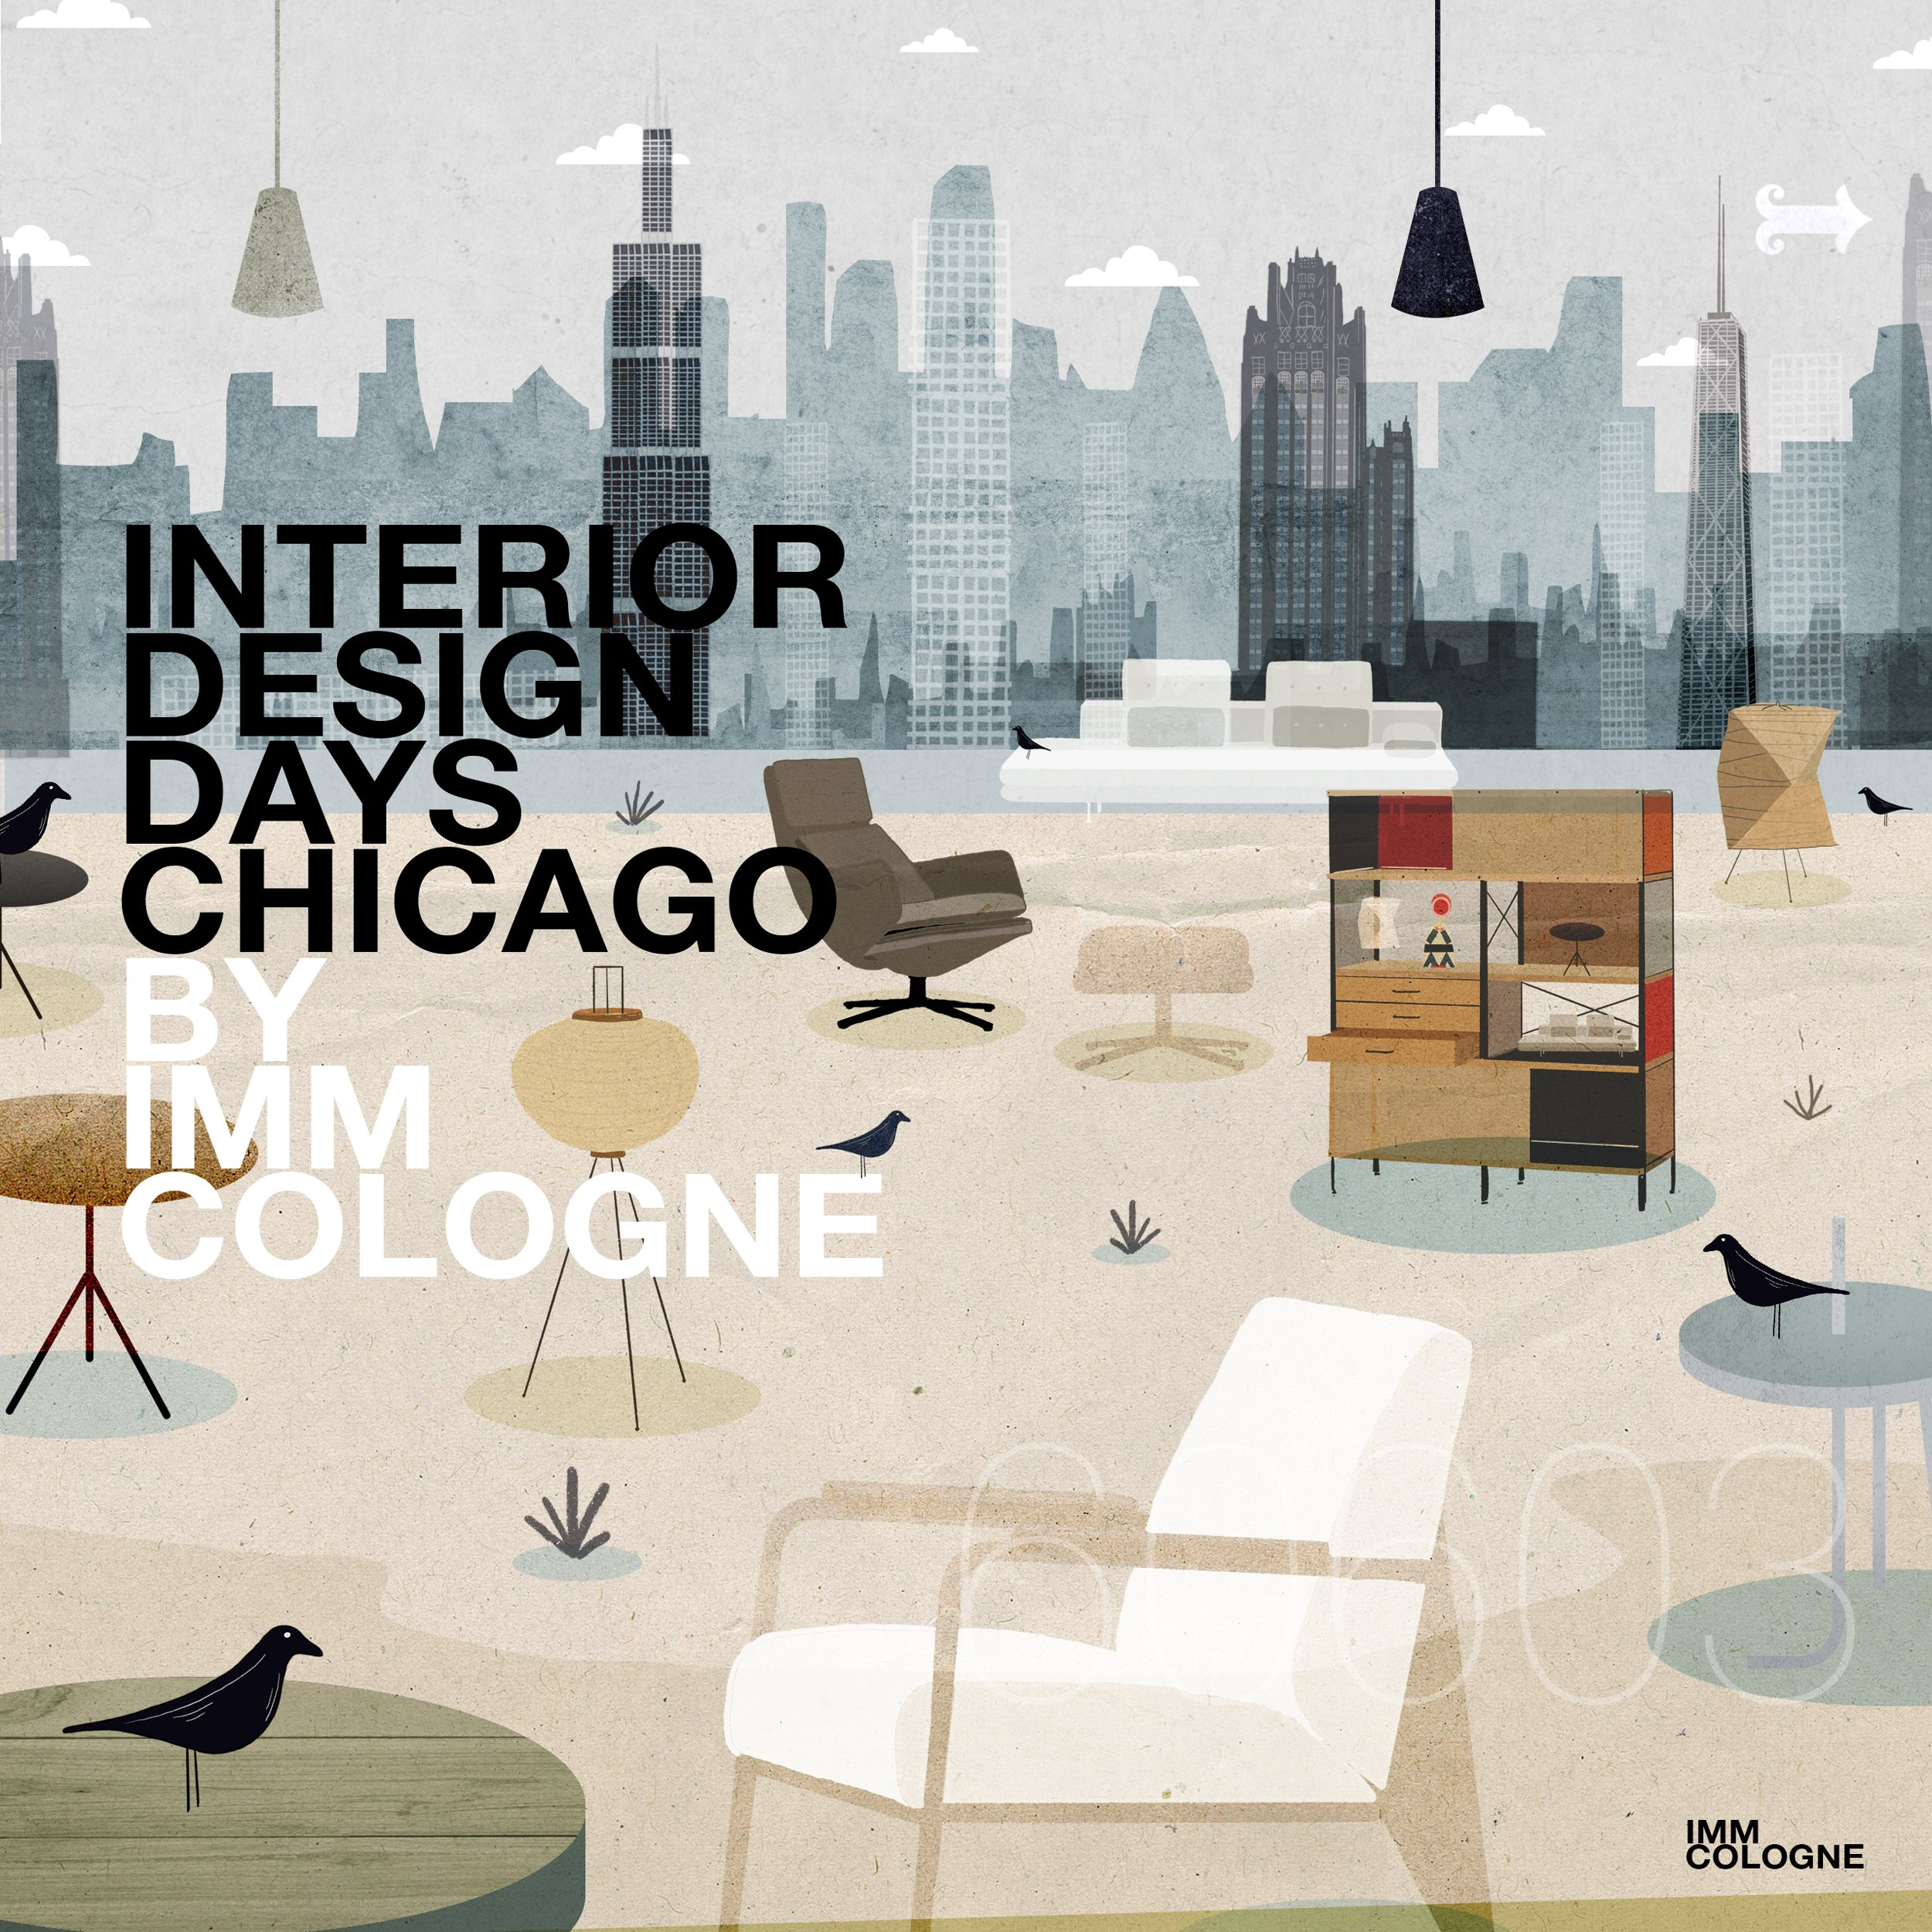 https://farconsulting.de/wp-content/uploads/2020/03/IMM_Interior_Design_Day_Chicago_2020_qua.jpg